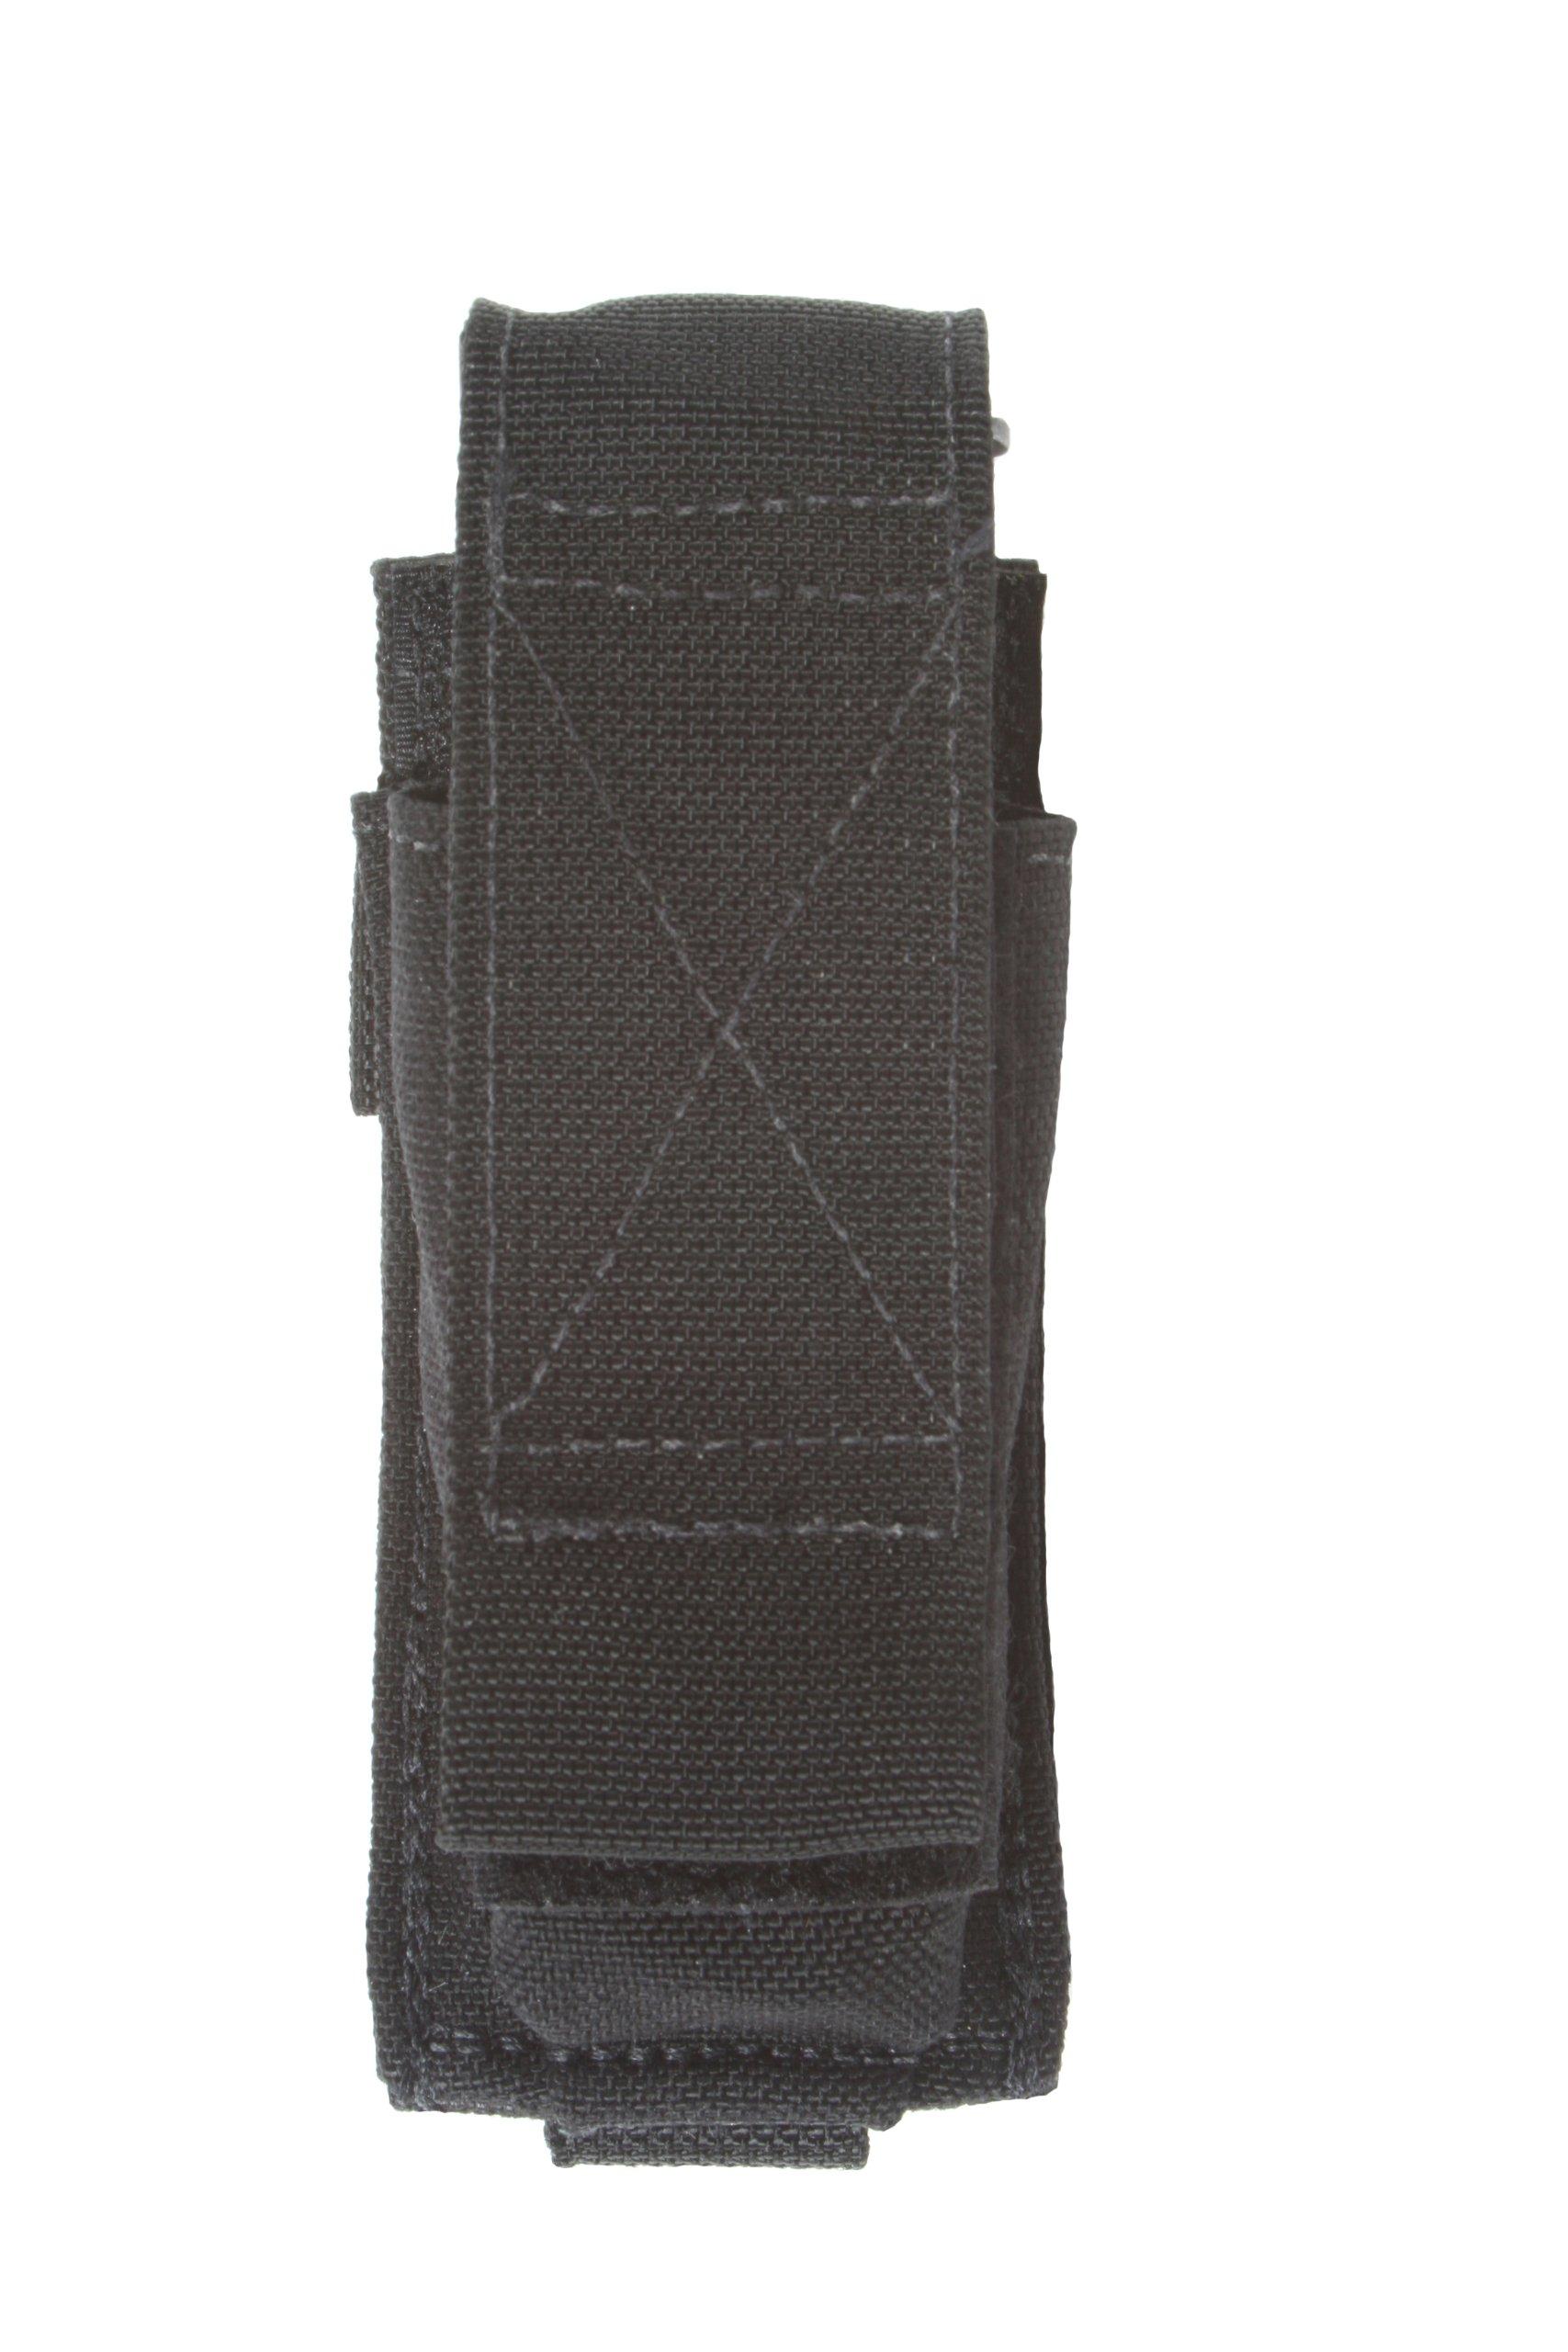 Spec-Ops Brand Super Sheath Single (Black)